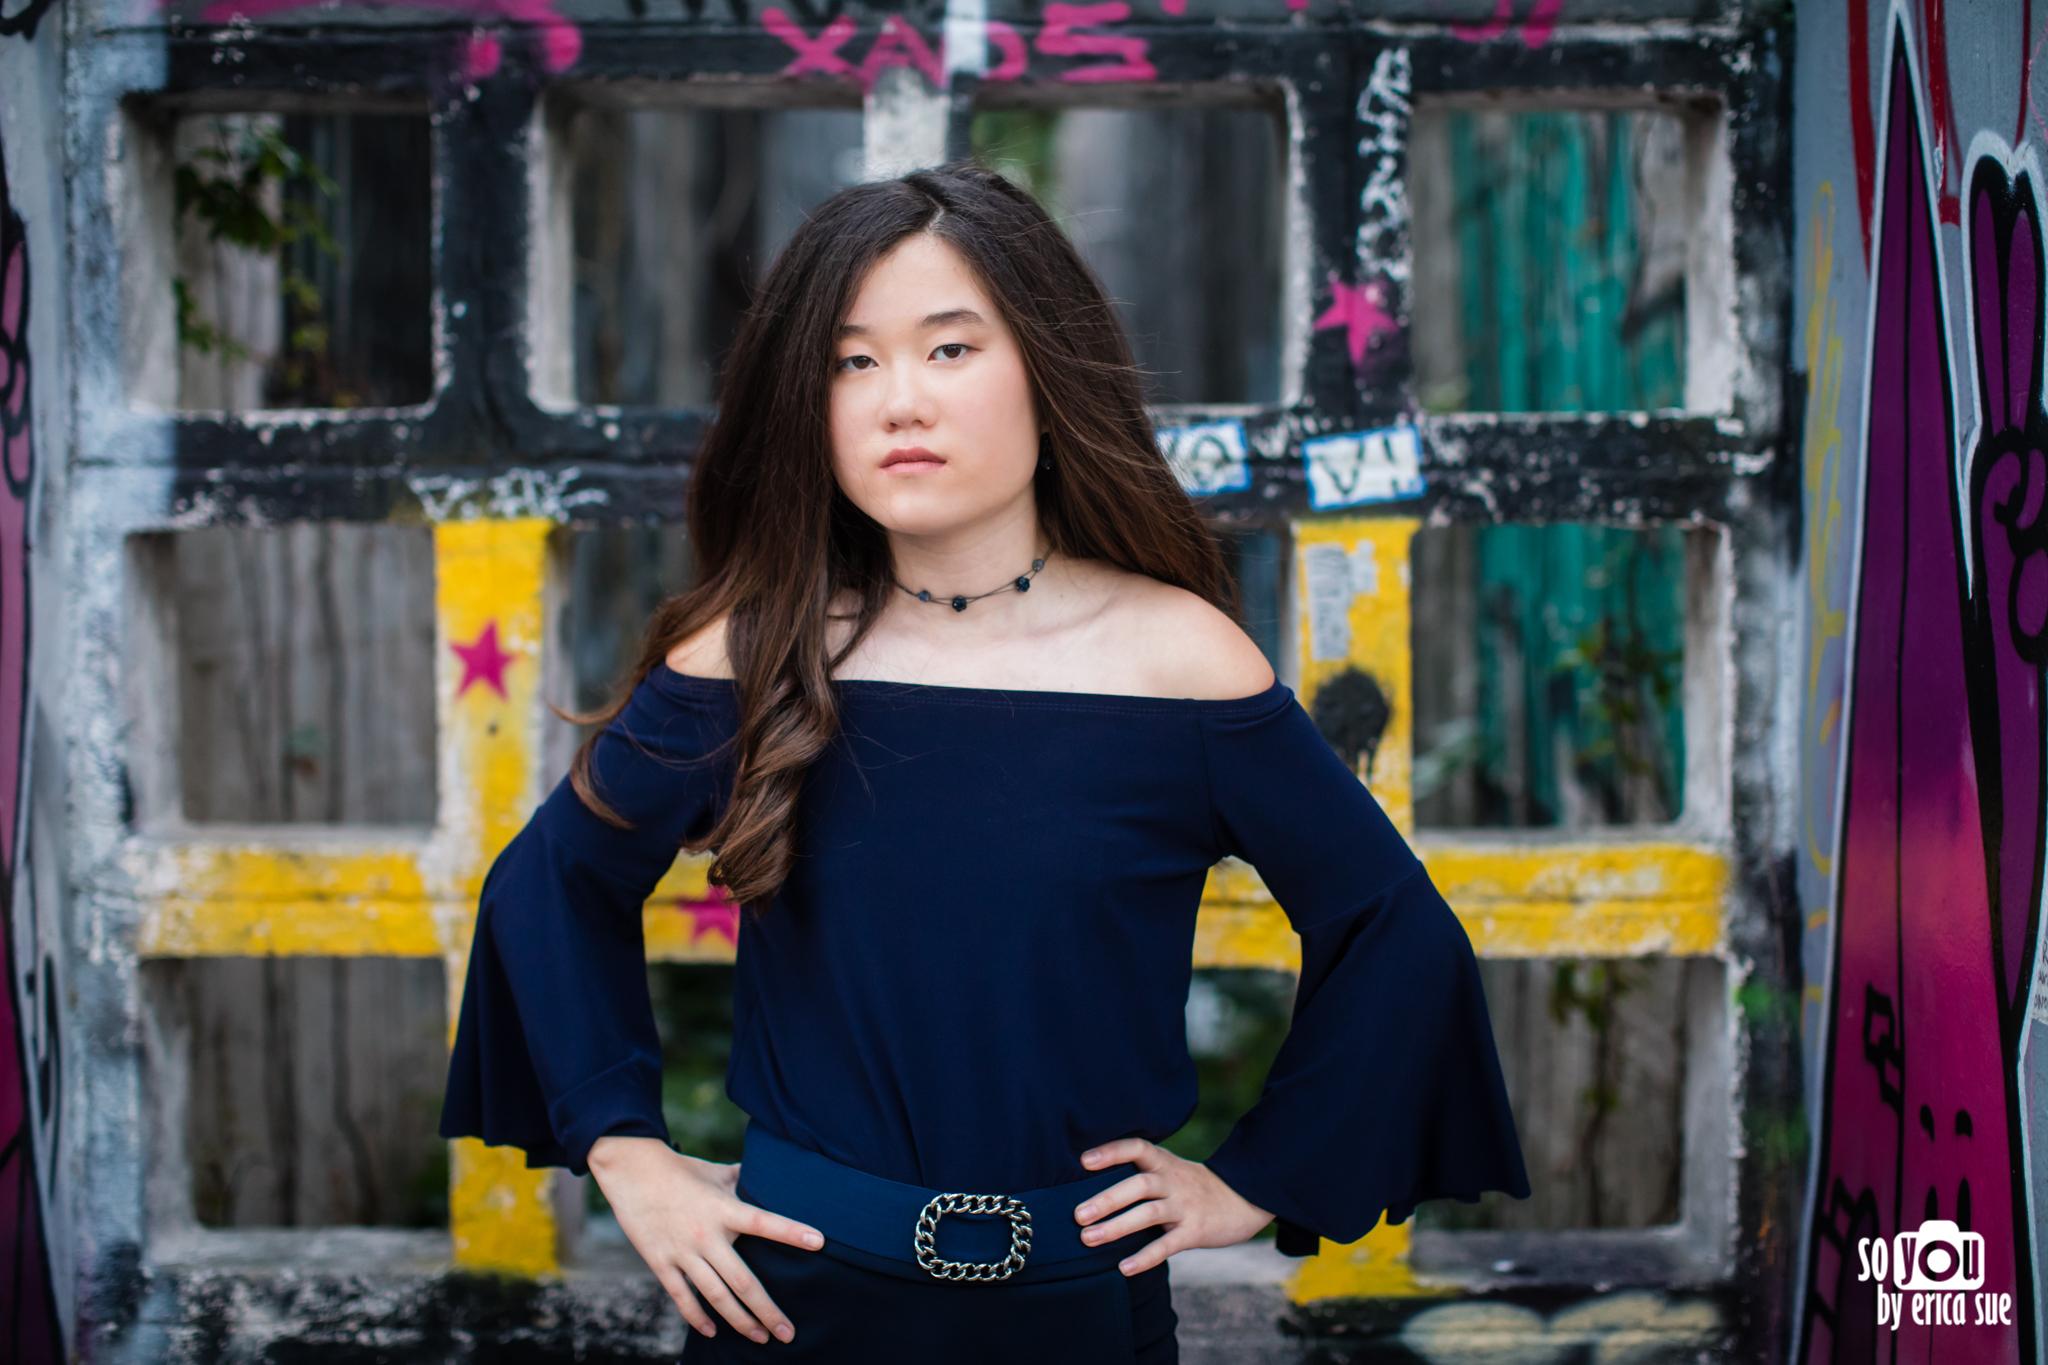 so-you-by-erica-sue-mitzvah-pre-shoot-photoshoot-wynwood-walls-miami-davie-fl-photography-2101.jpg